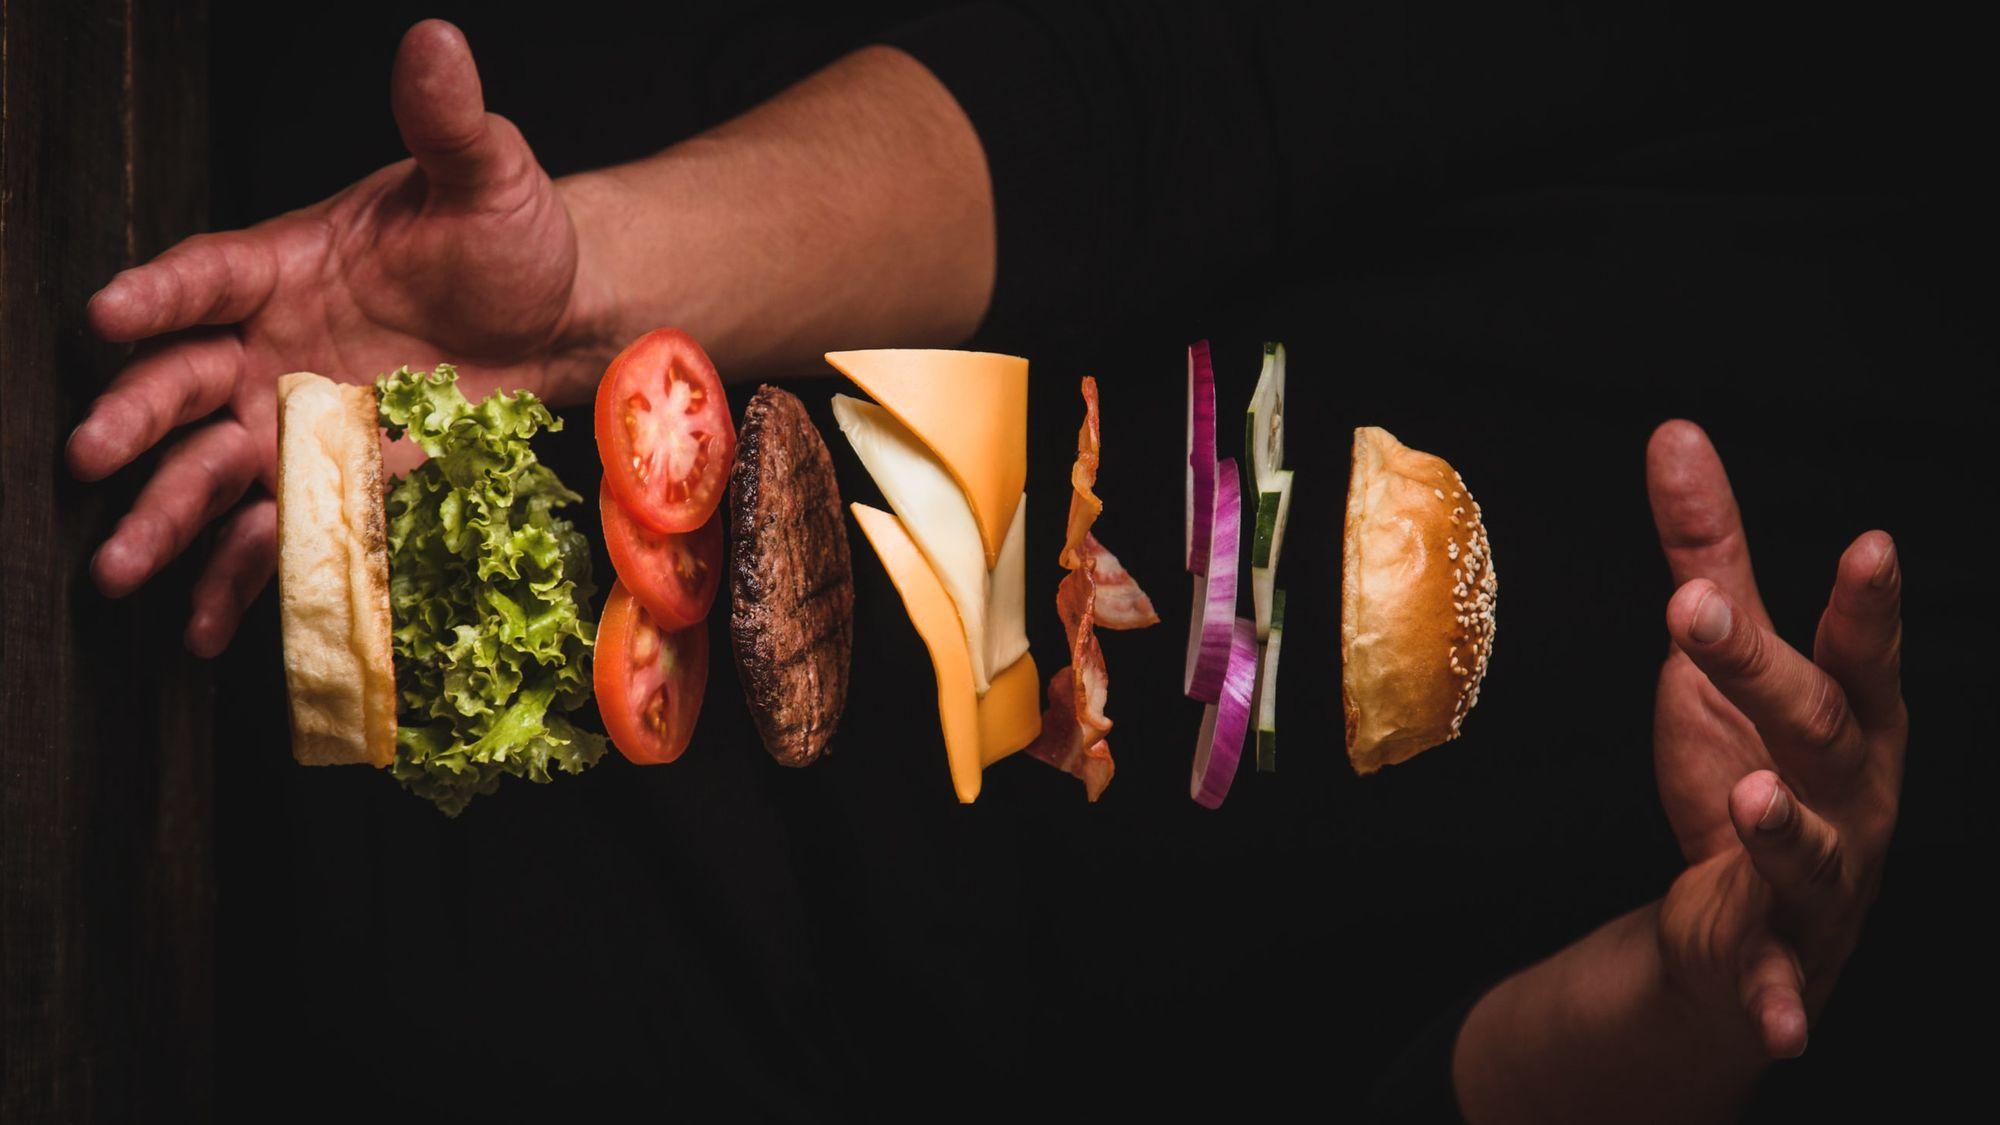 bundling a burger